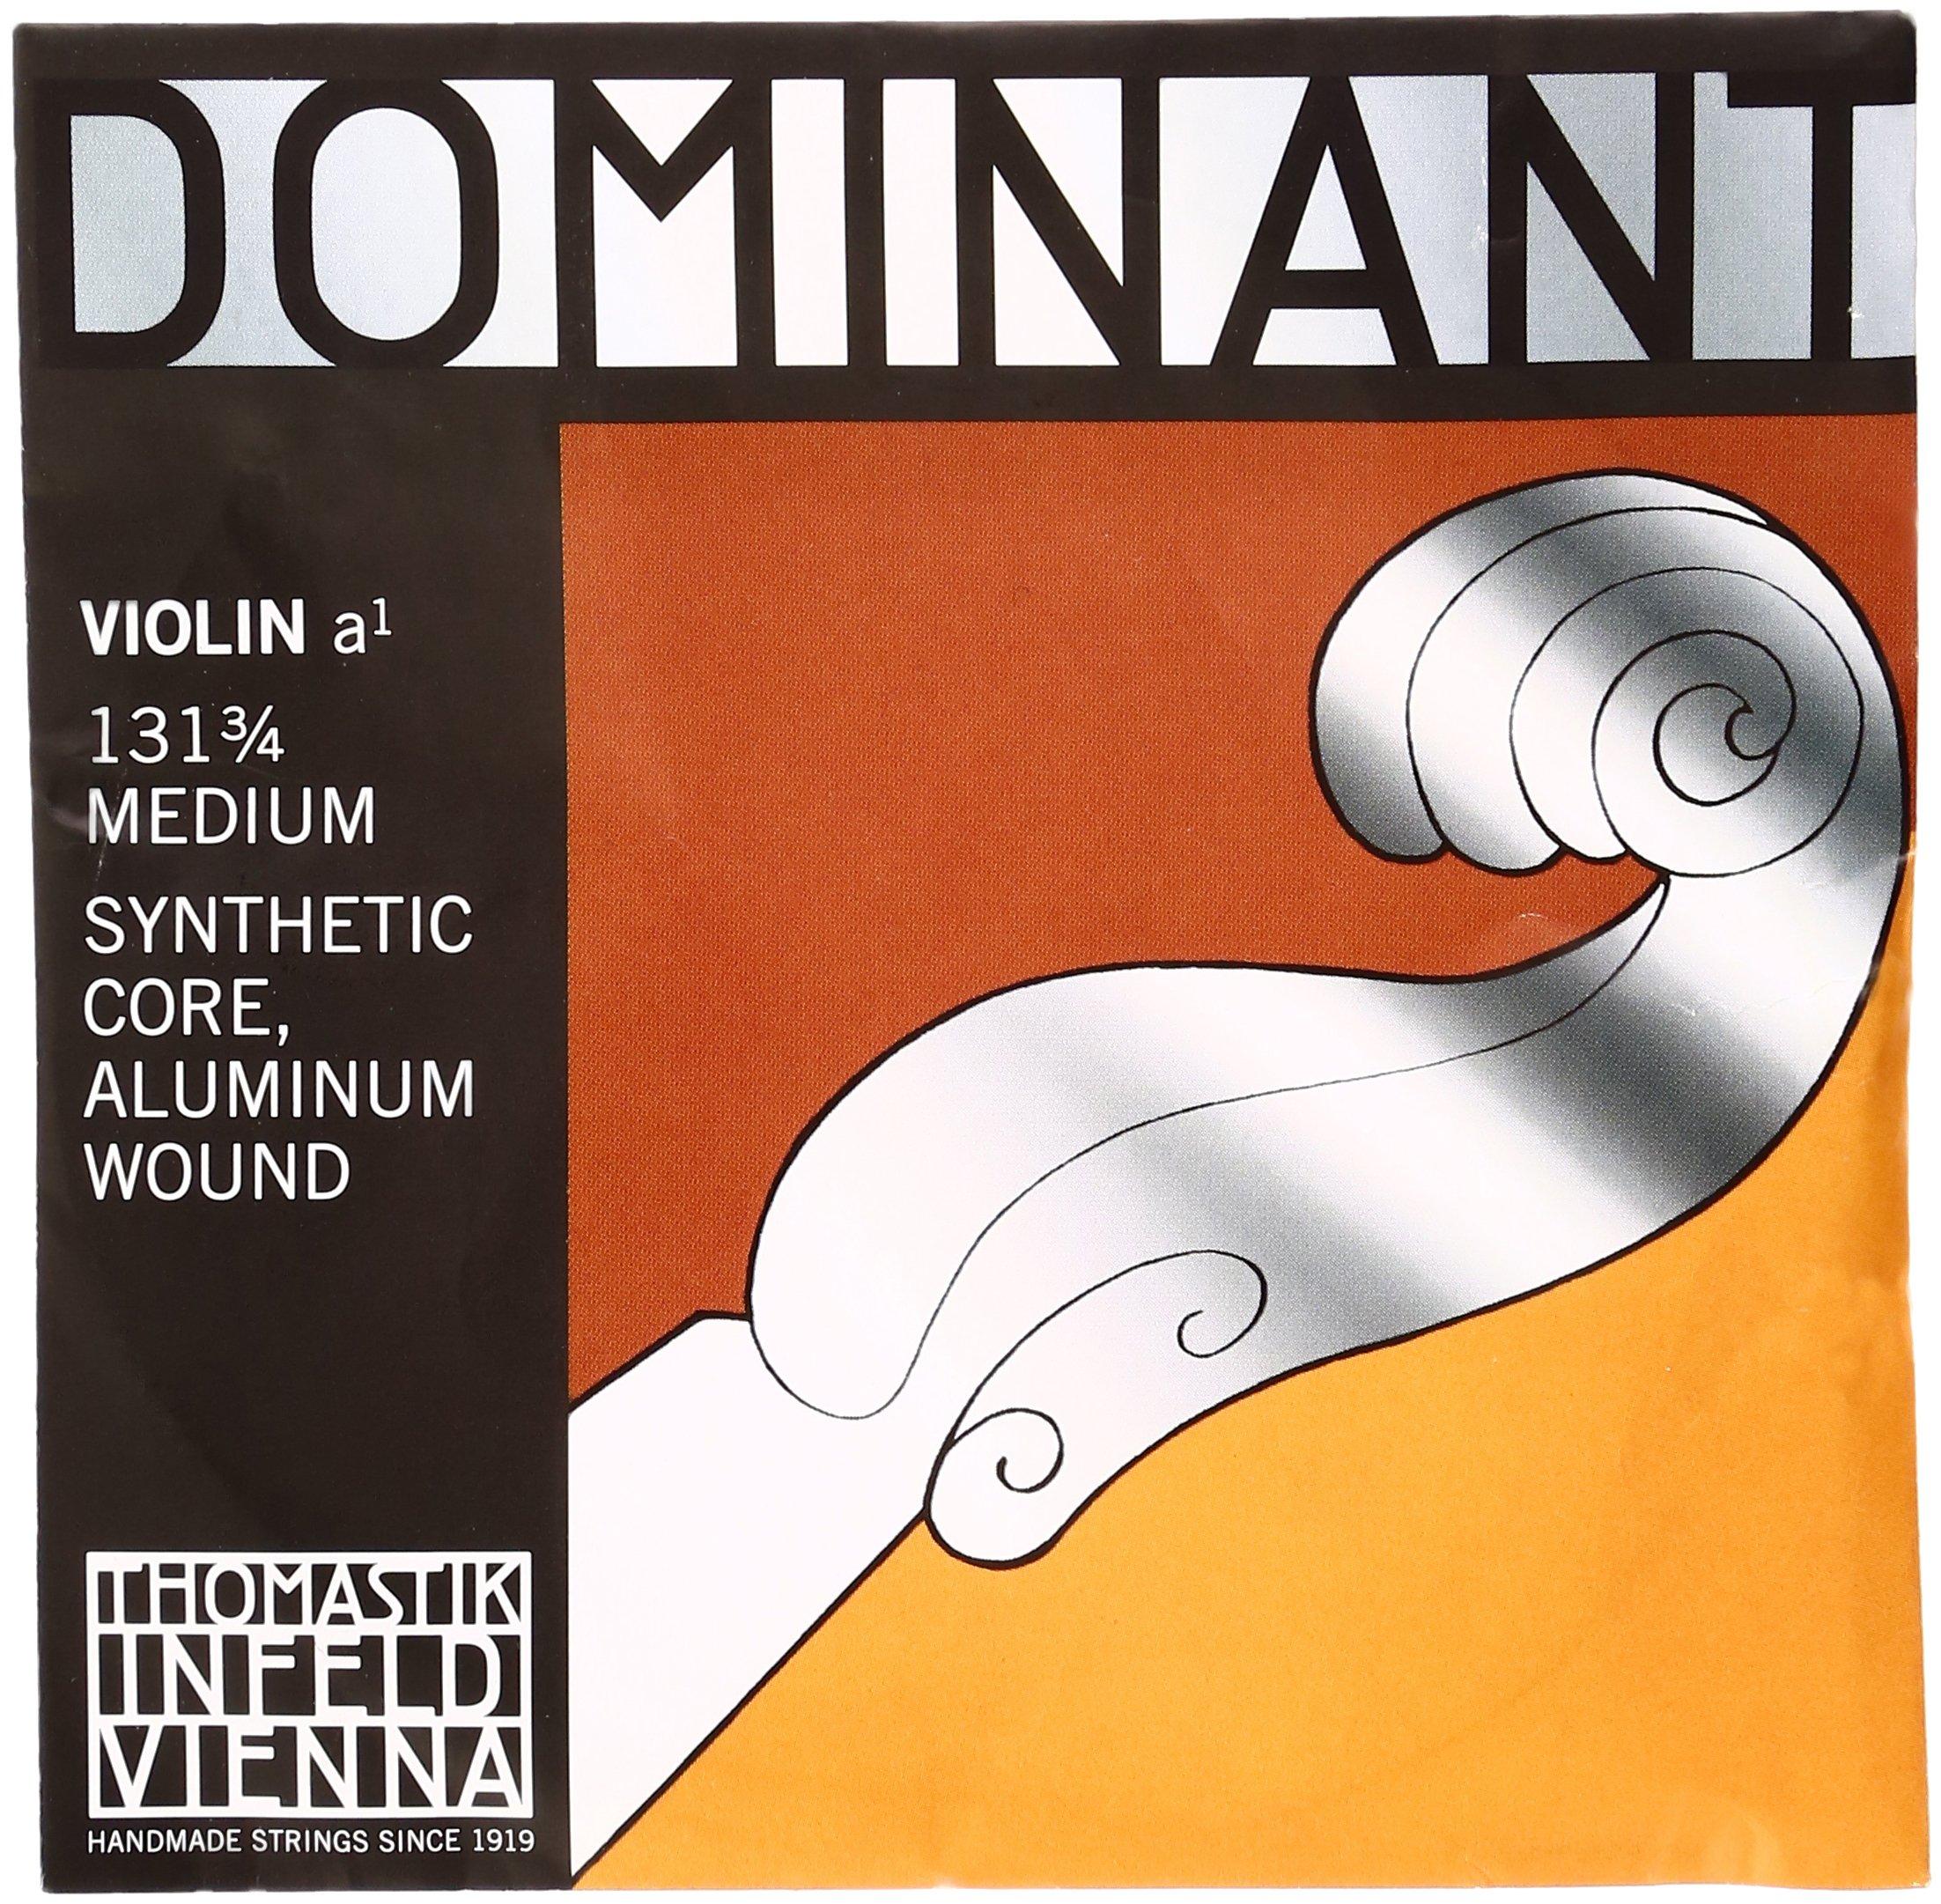 Dr Thomastik-Infeld 131.34 Dominant Violin String, Single A String, 131, 3/4 Size, Aluminum Wound